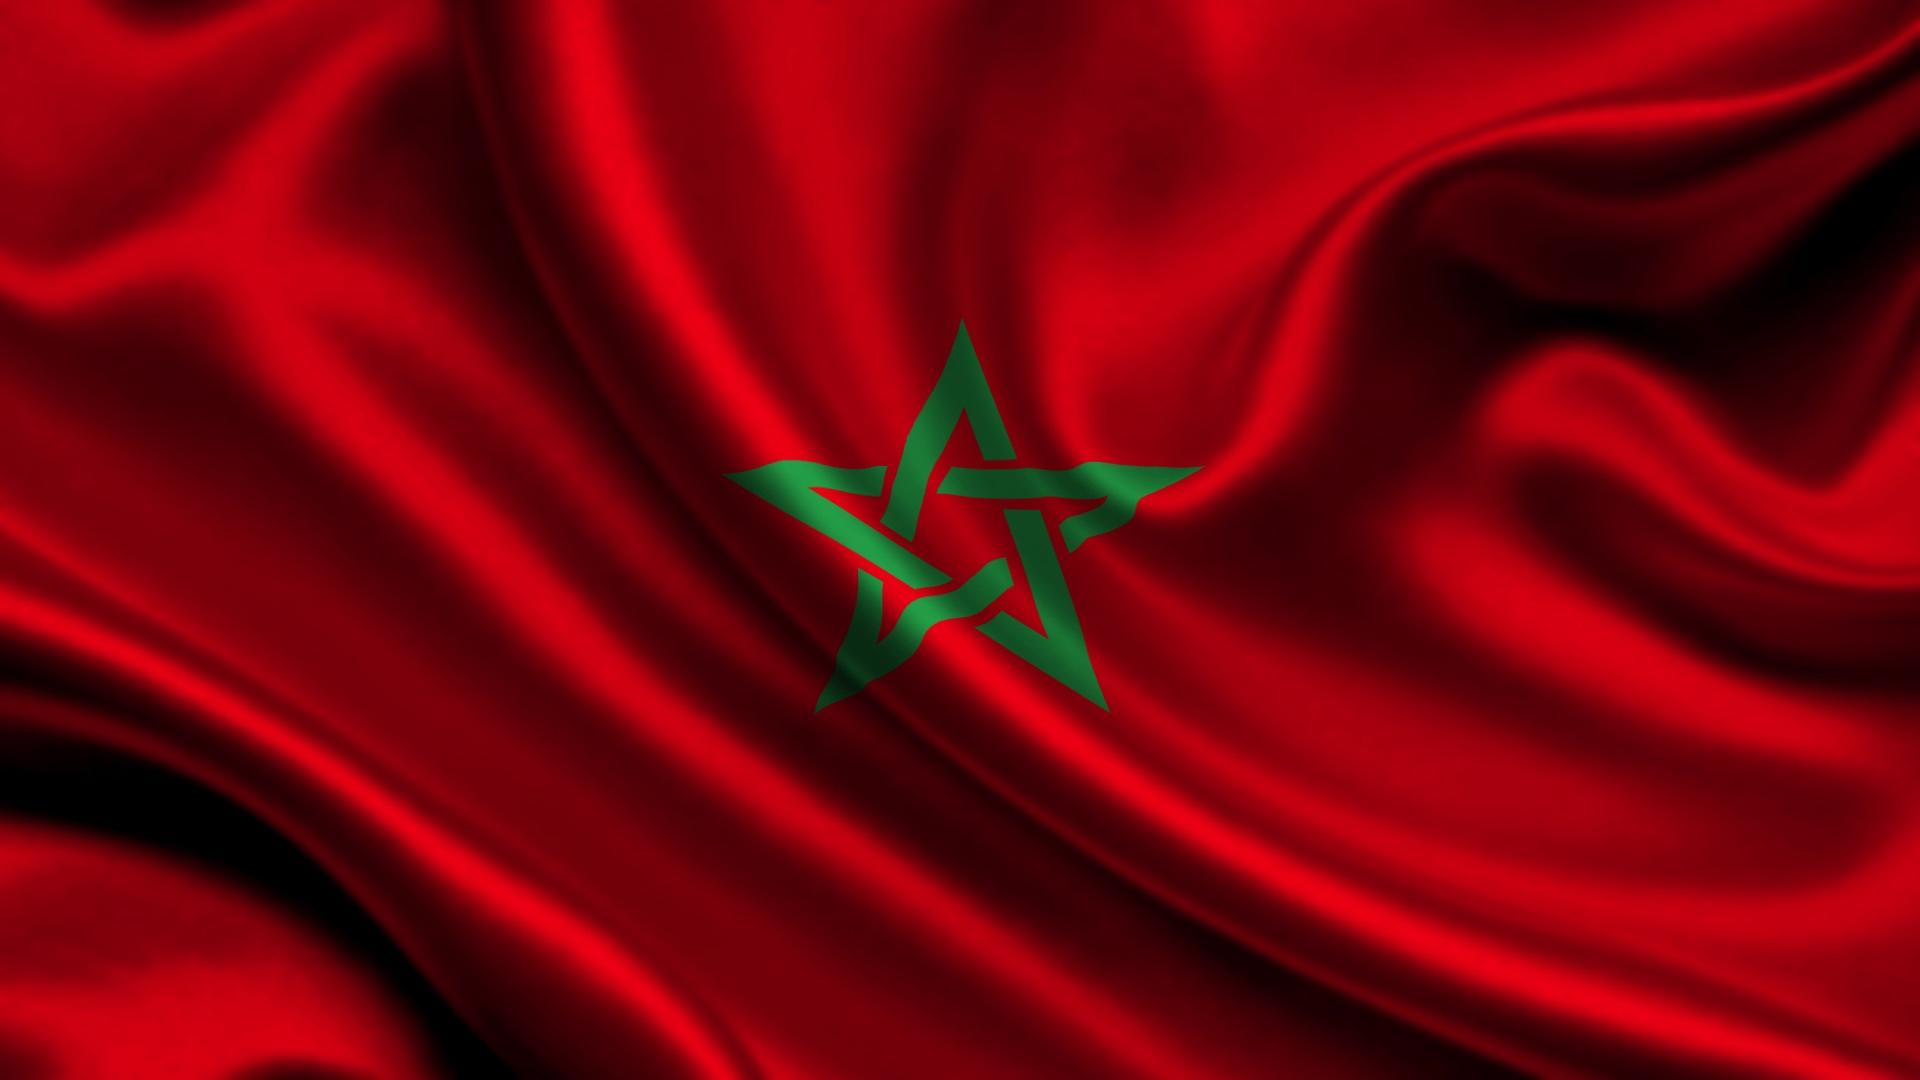 Morocco Atlas Flag Star   Stock Photos Images HD Wallpaper 1920x1080